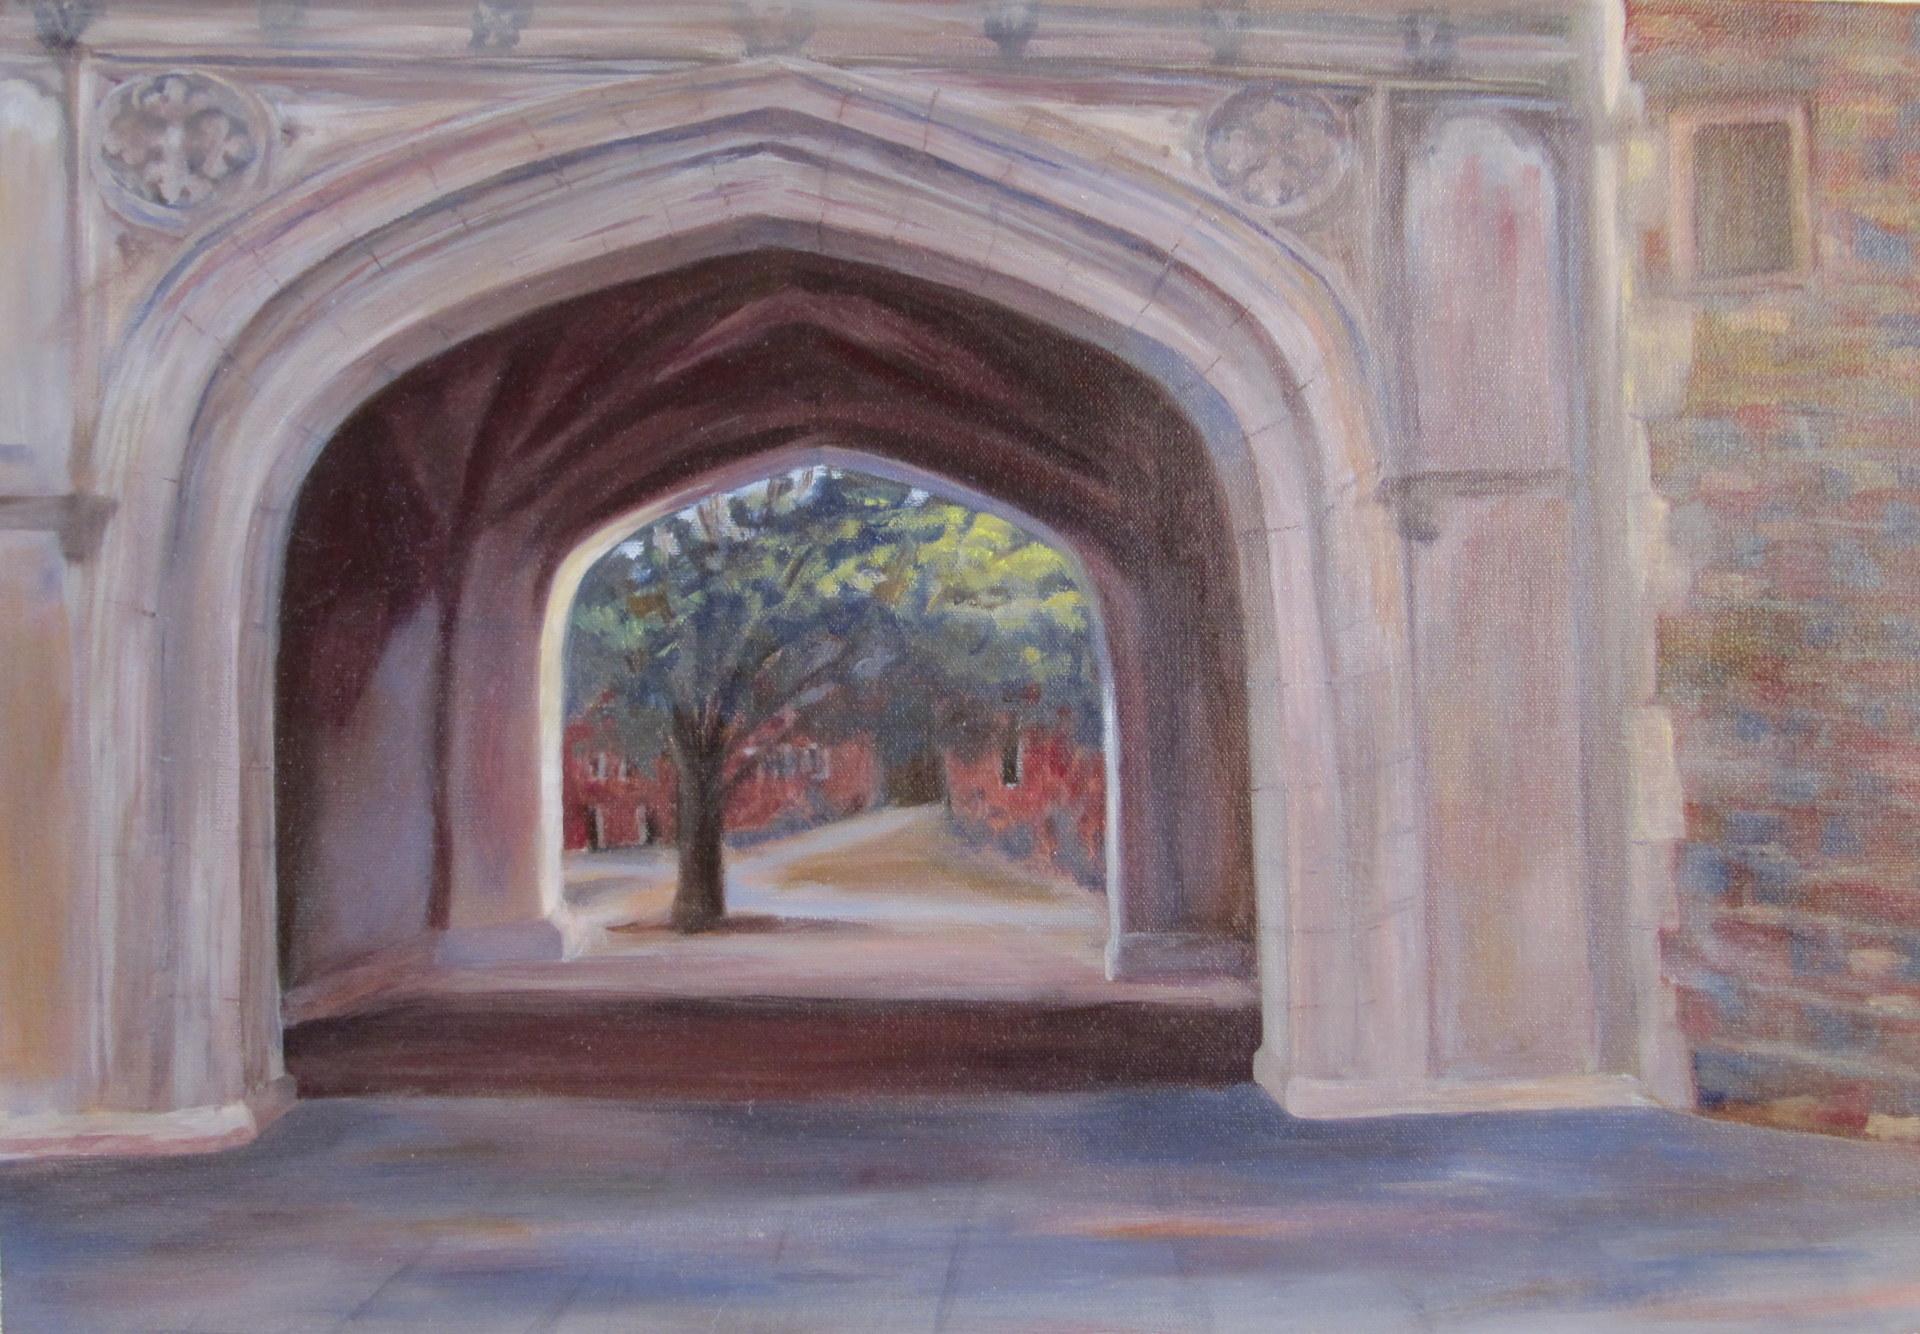 Priceton Arch II